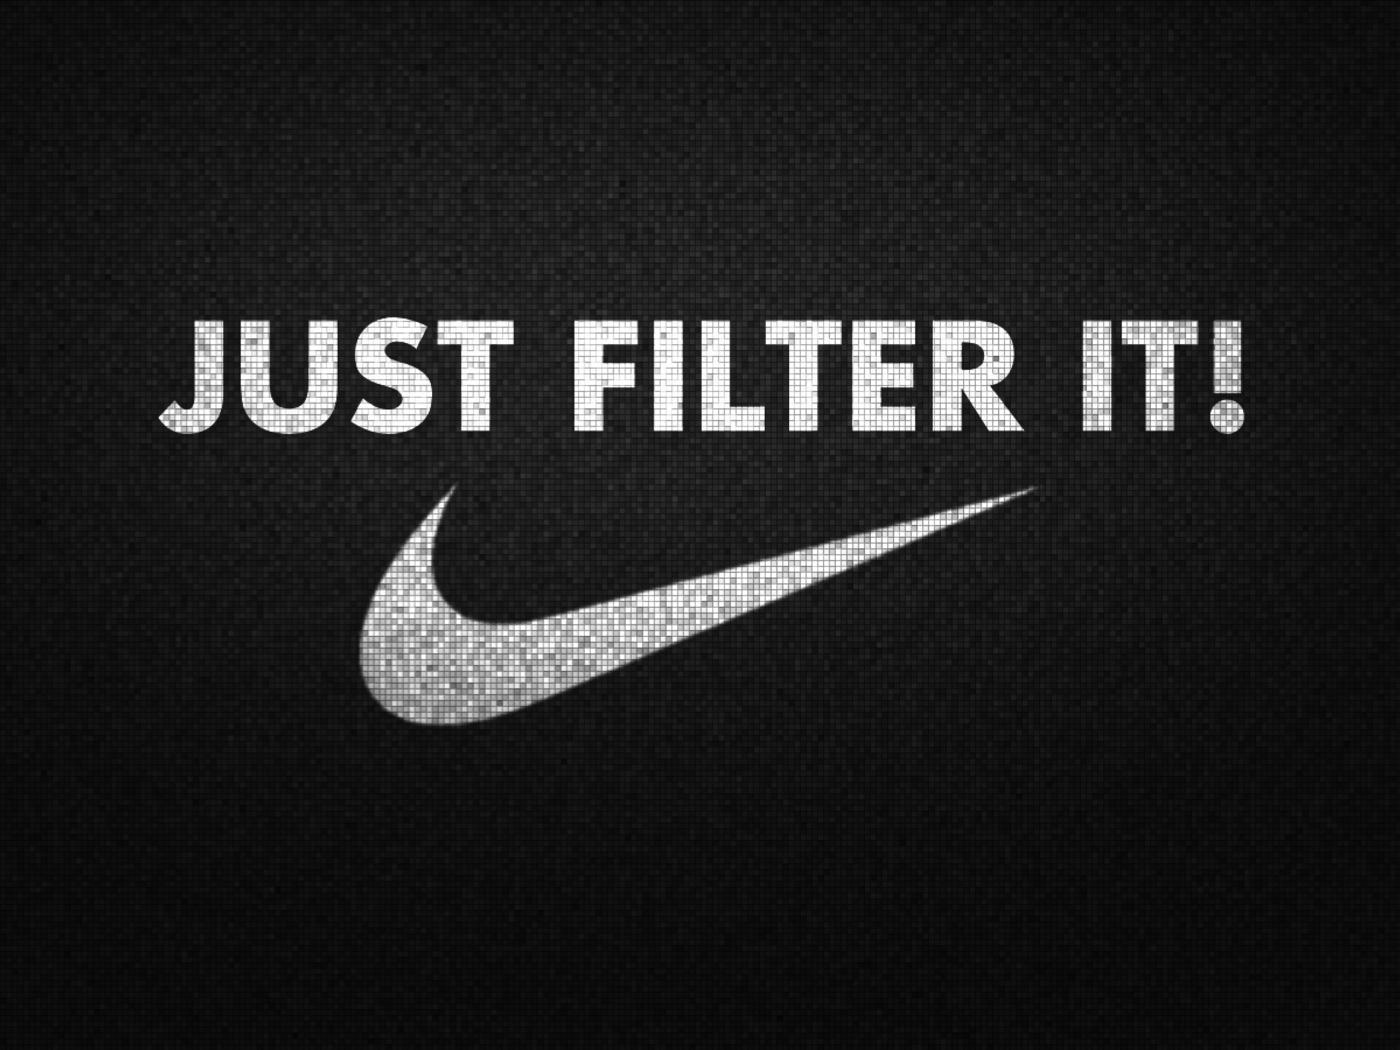 nike-funny-typography-qhd.jpg